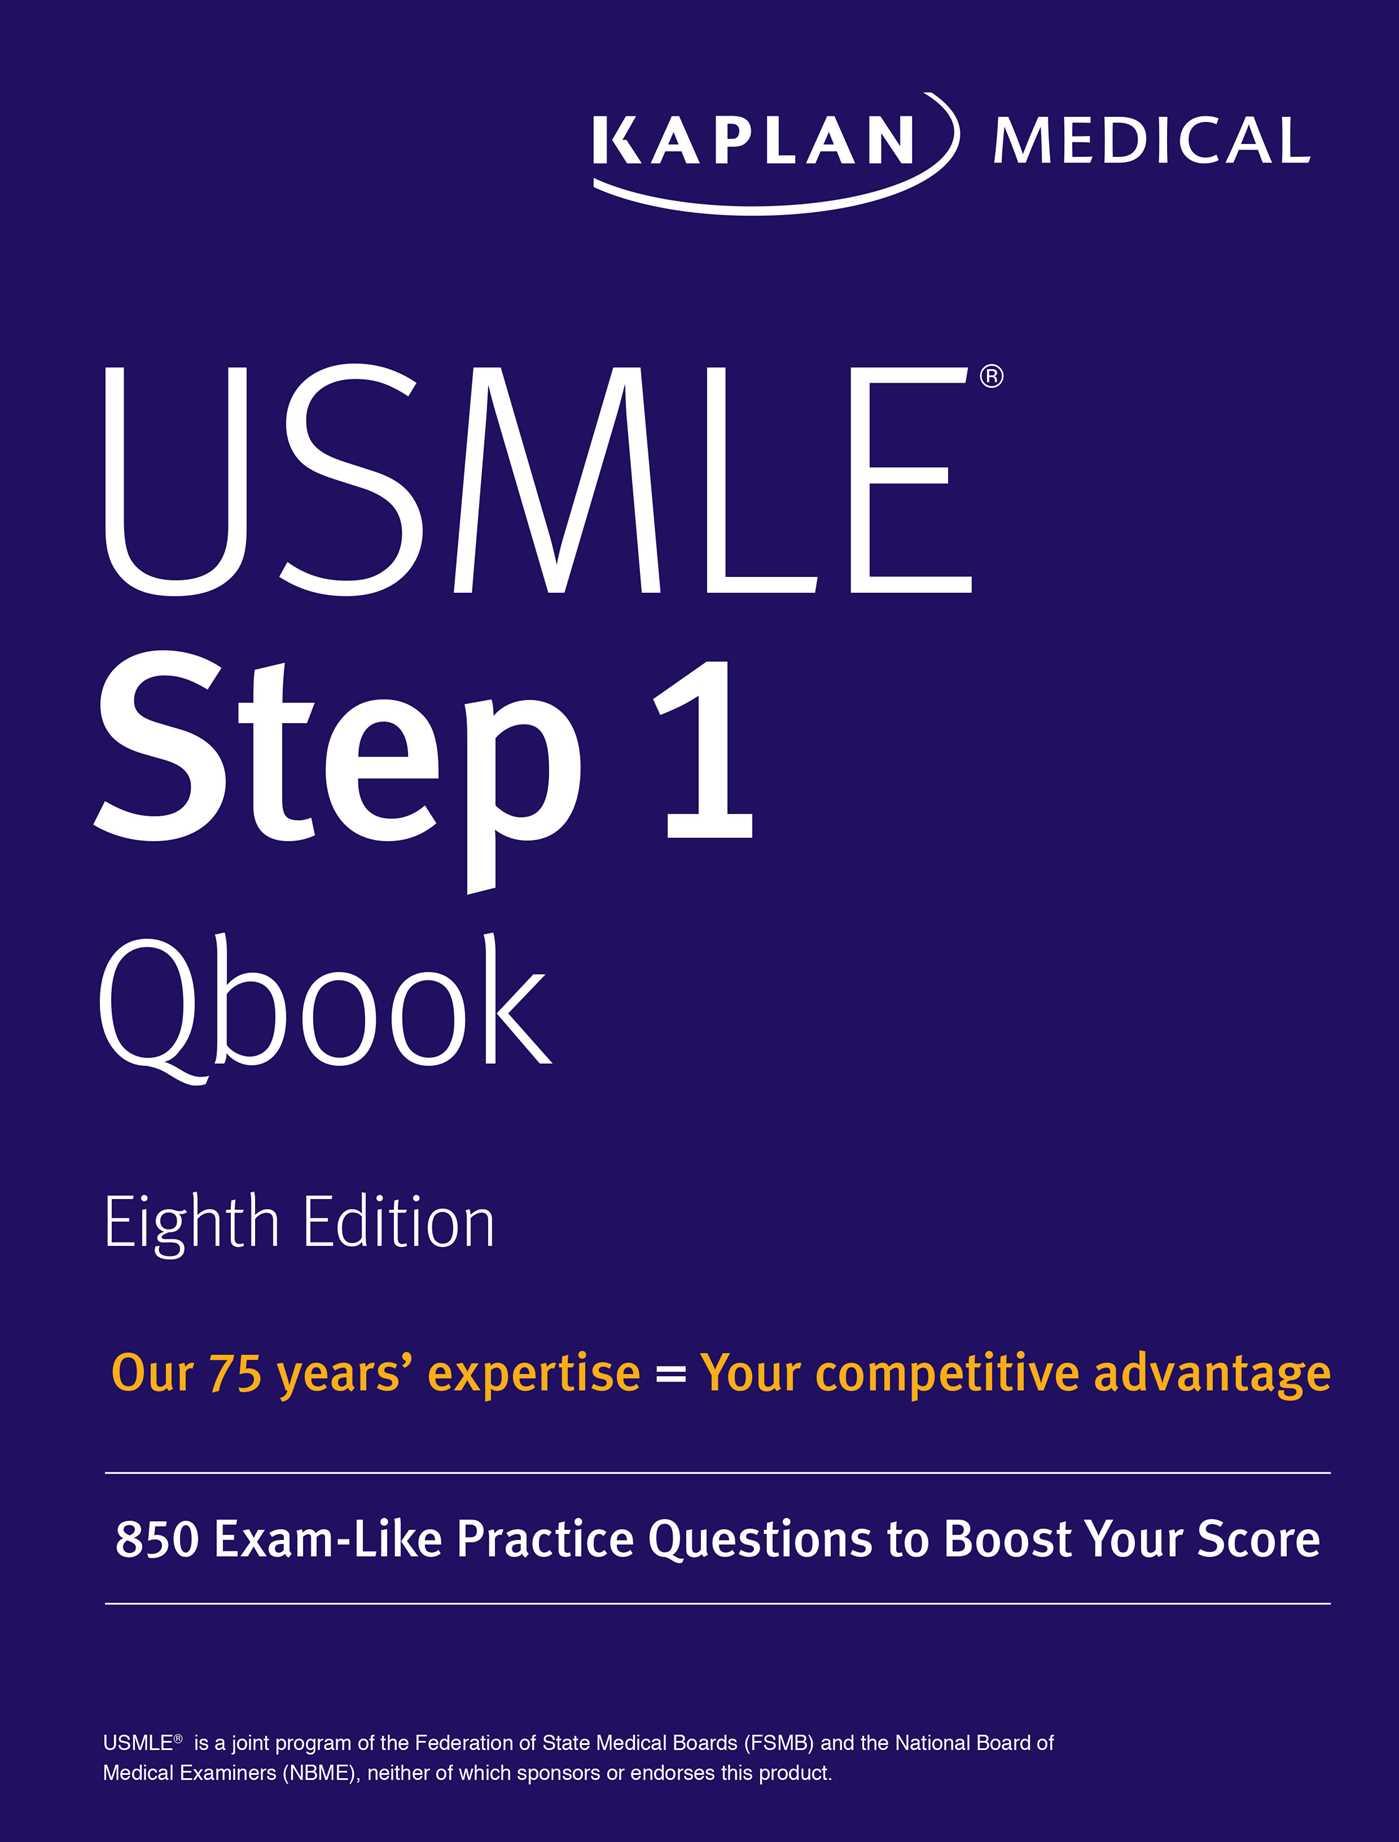 USMLE Step 1 Qbook | Book by Kaplan Medical | Official Publisher ...